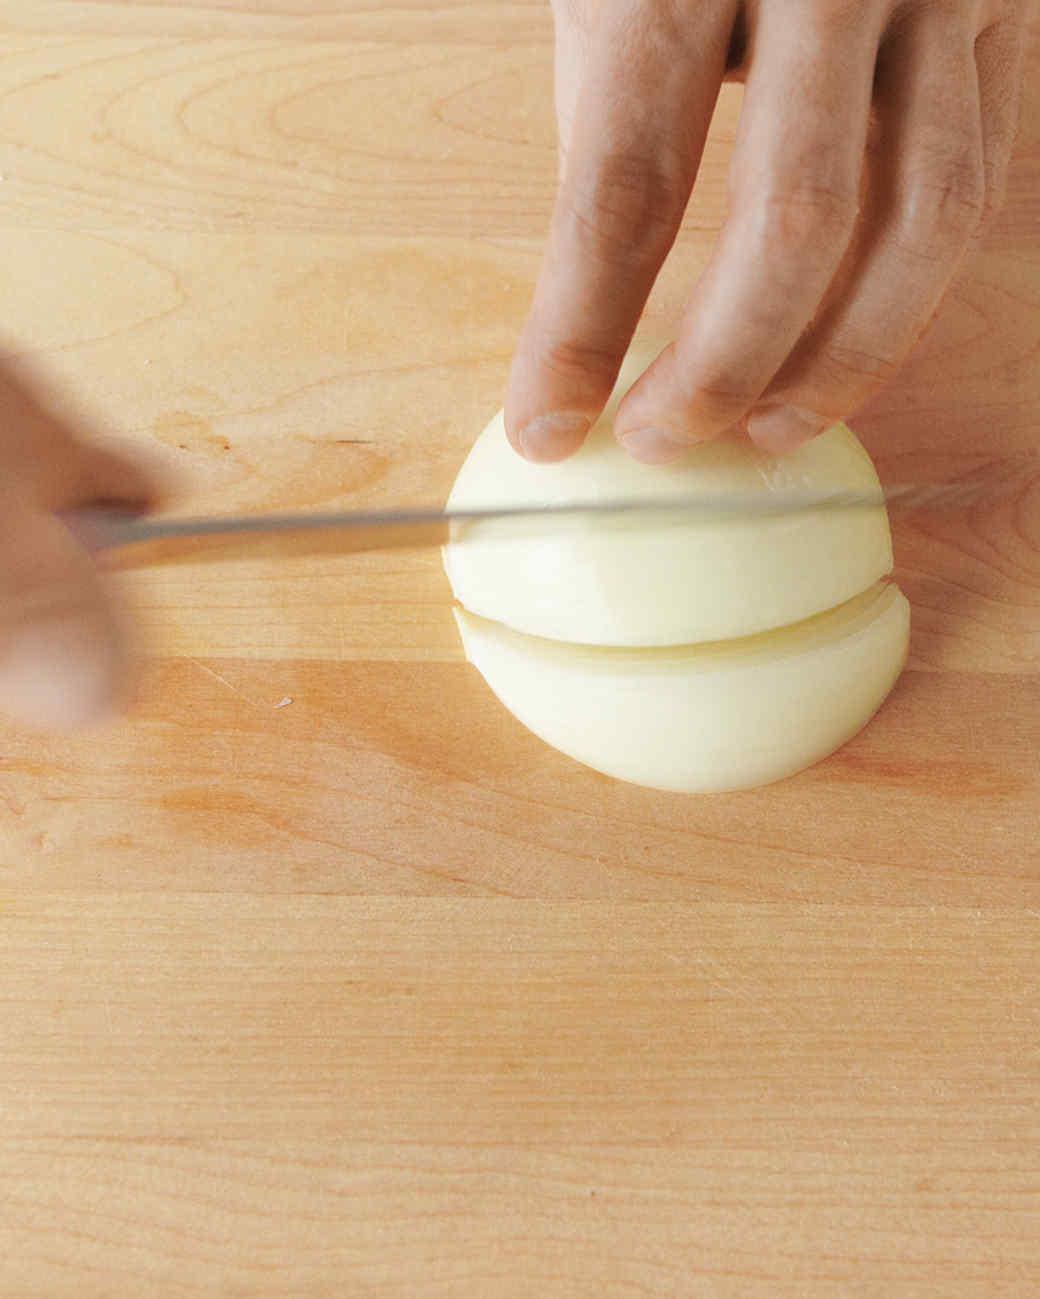 onion-wedge-1-med108359.jpg